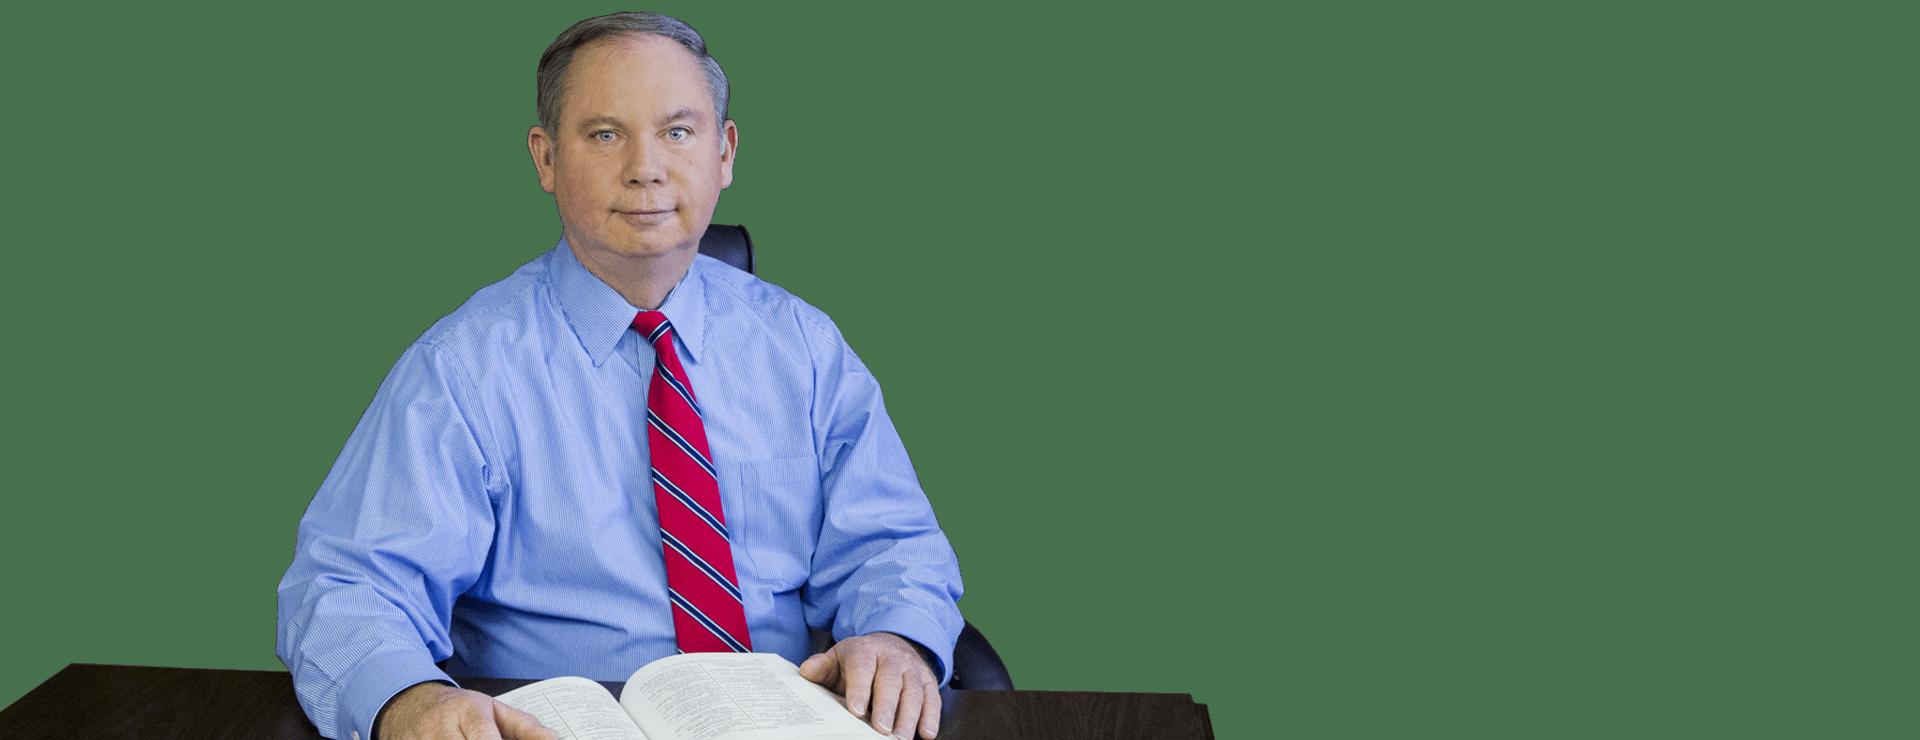 Attorney Johnson City TN | Divorce, Farmily Law & Personal Injury Lawyer